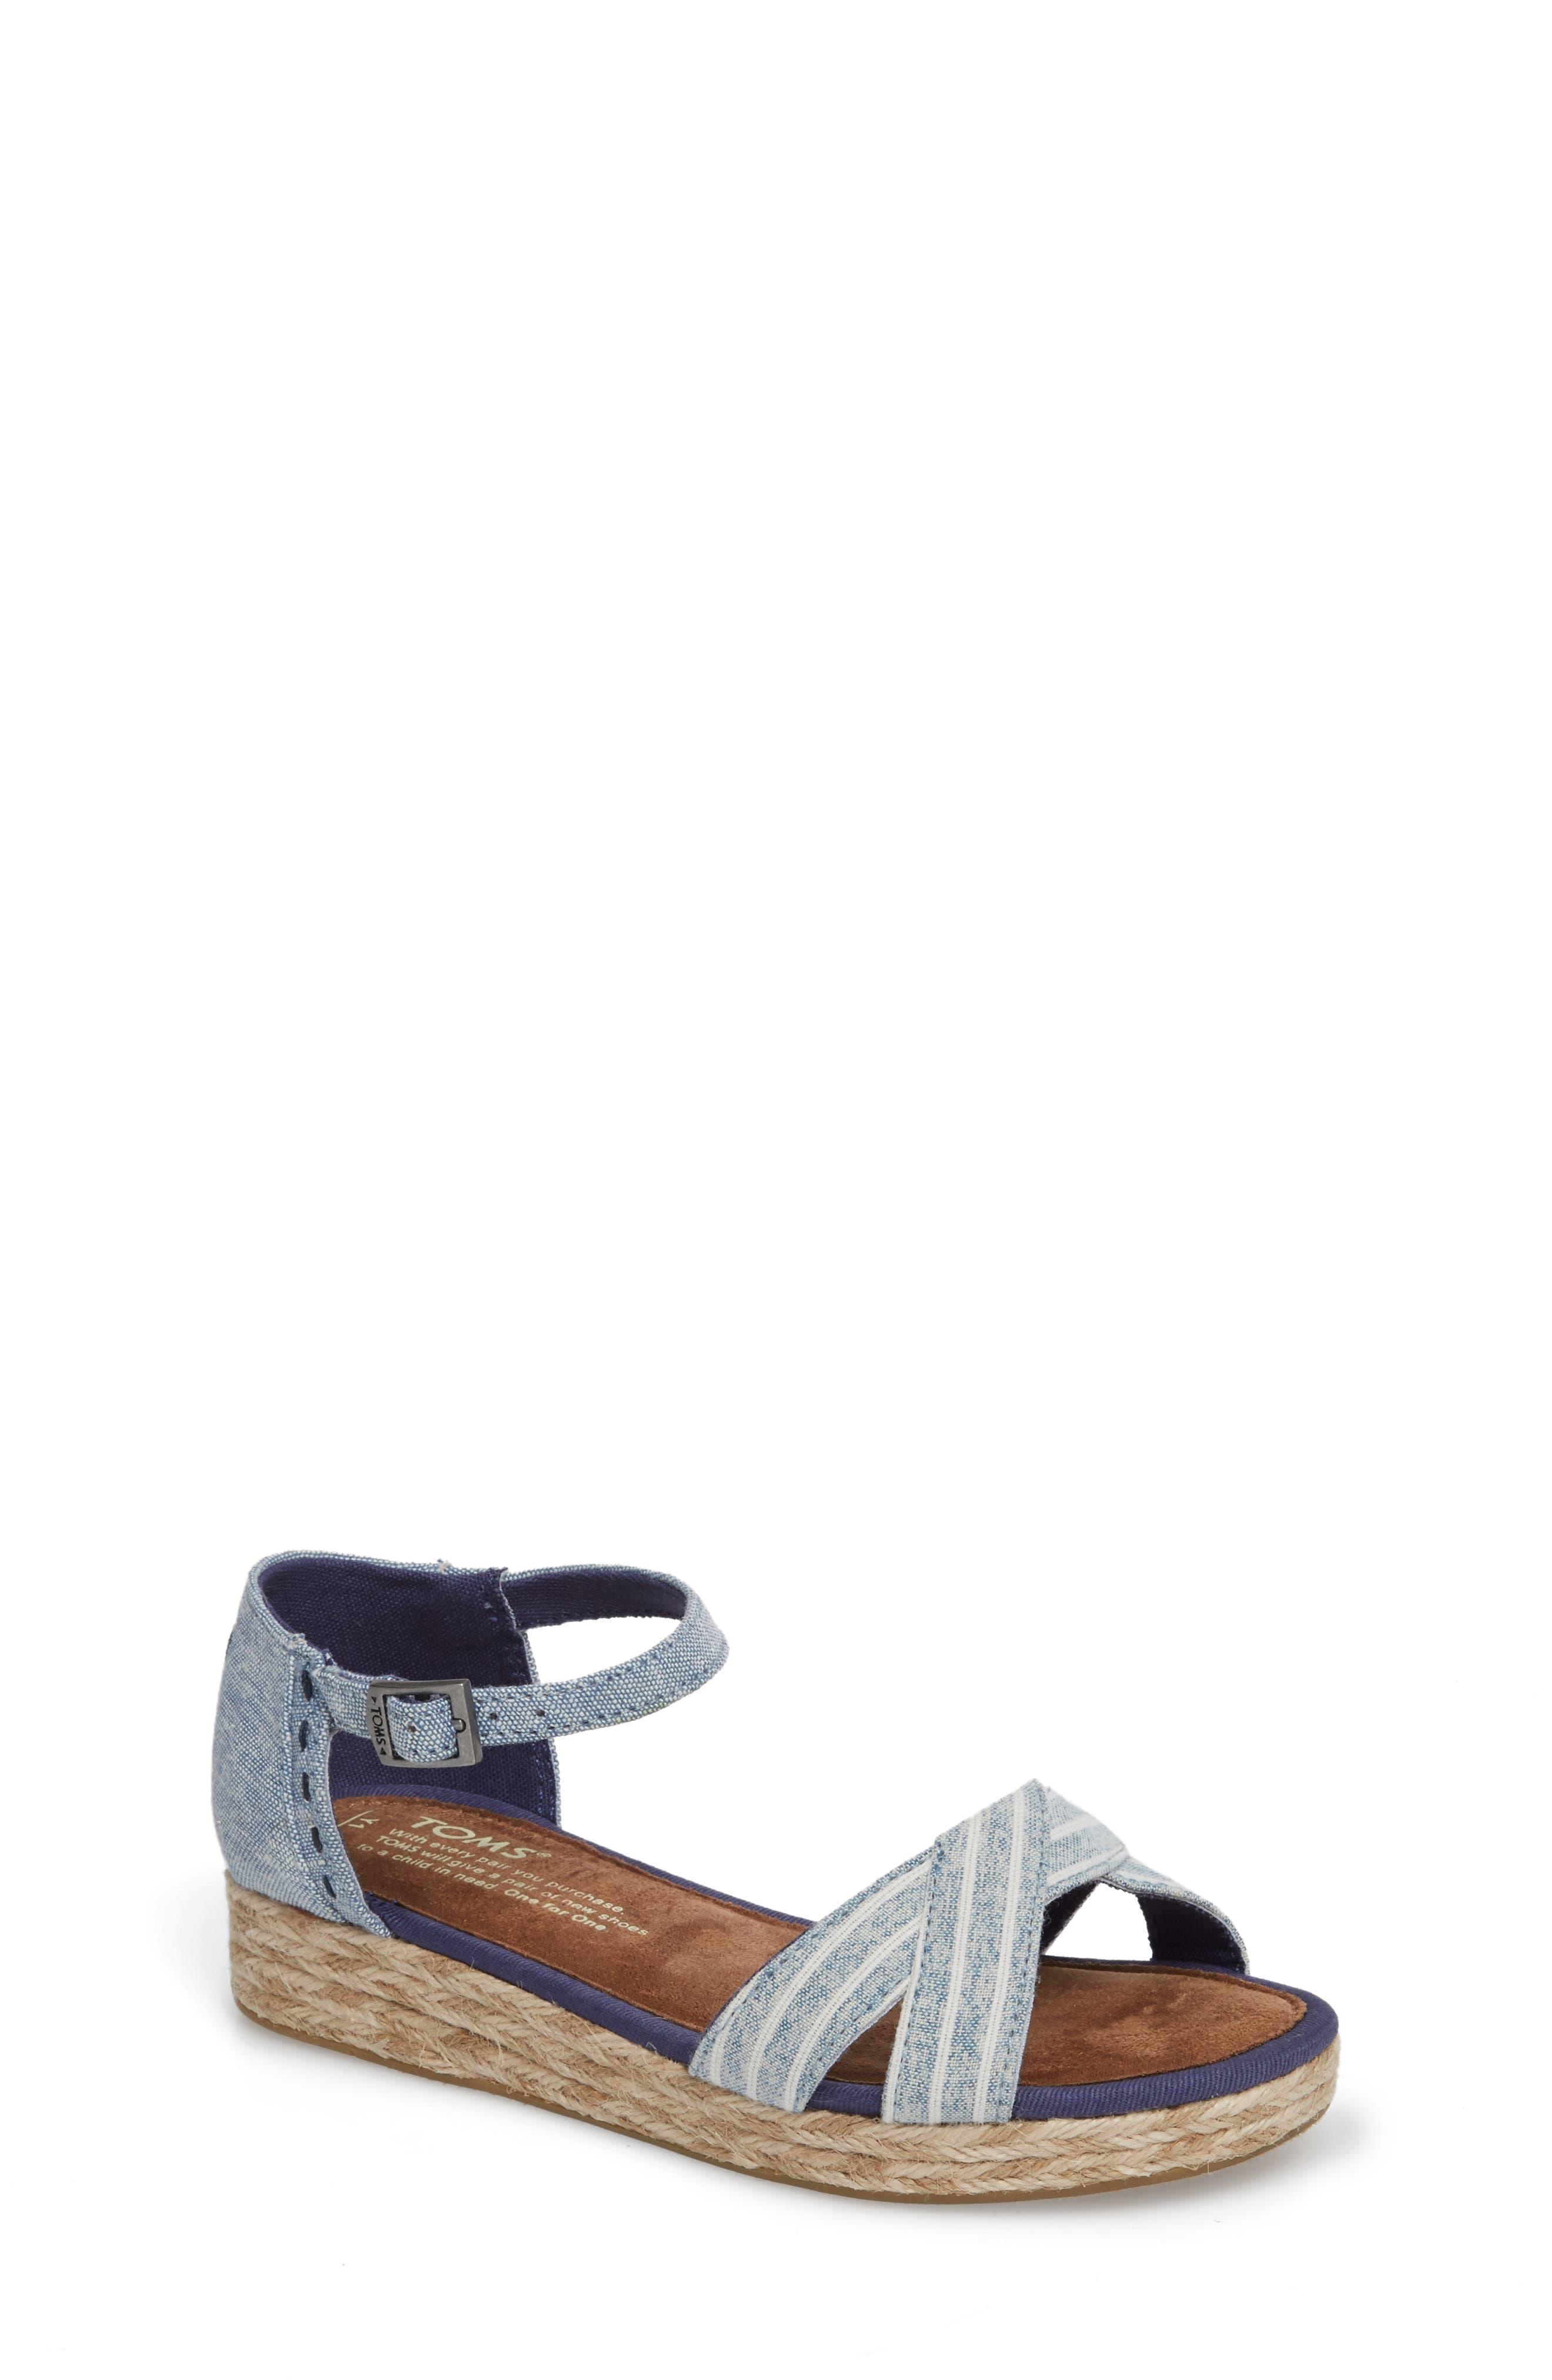 Harper Wedge Sandal,                         Main,                         color, 430